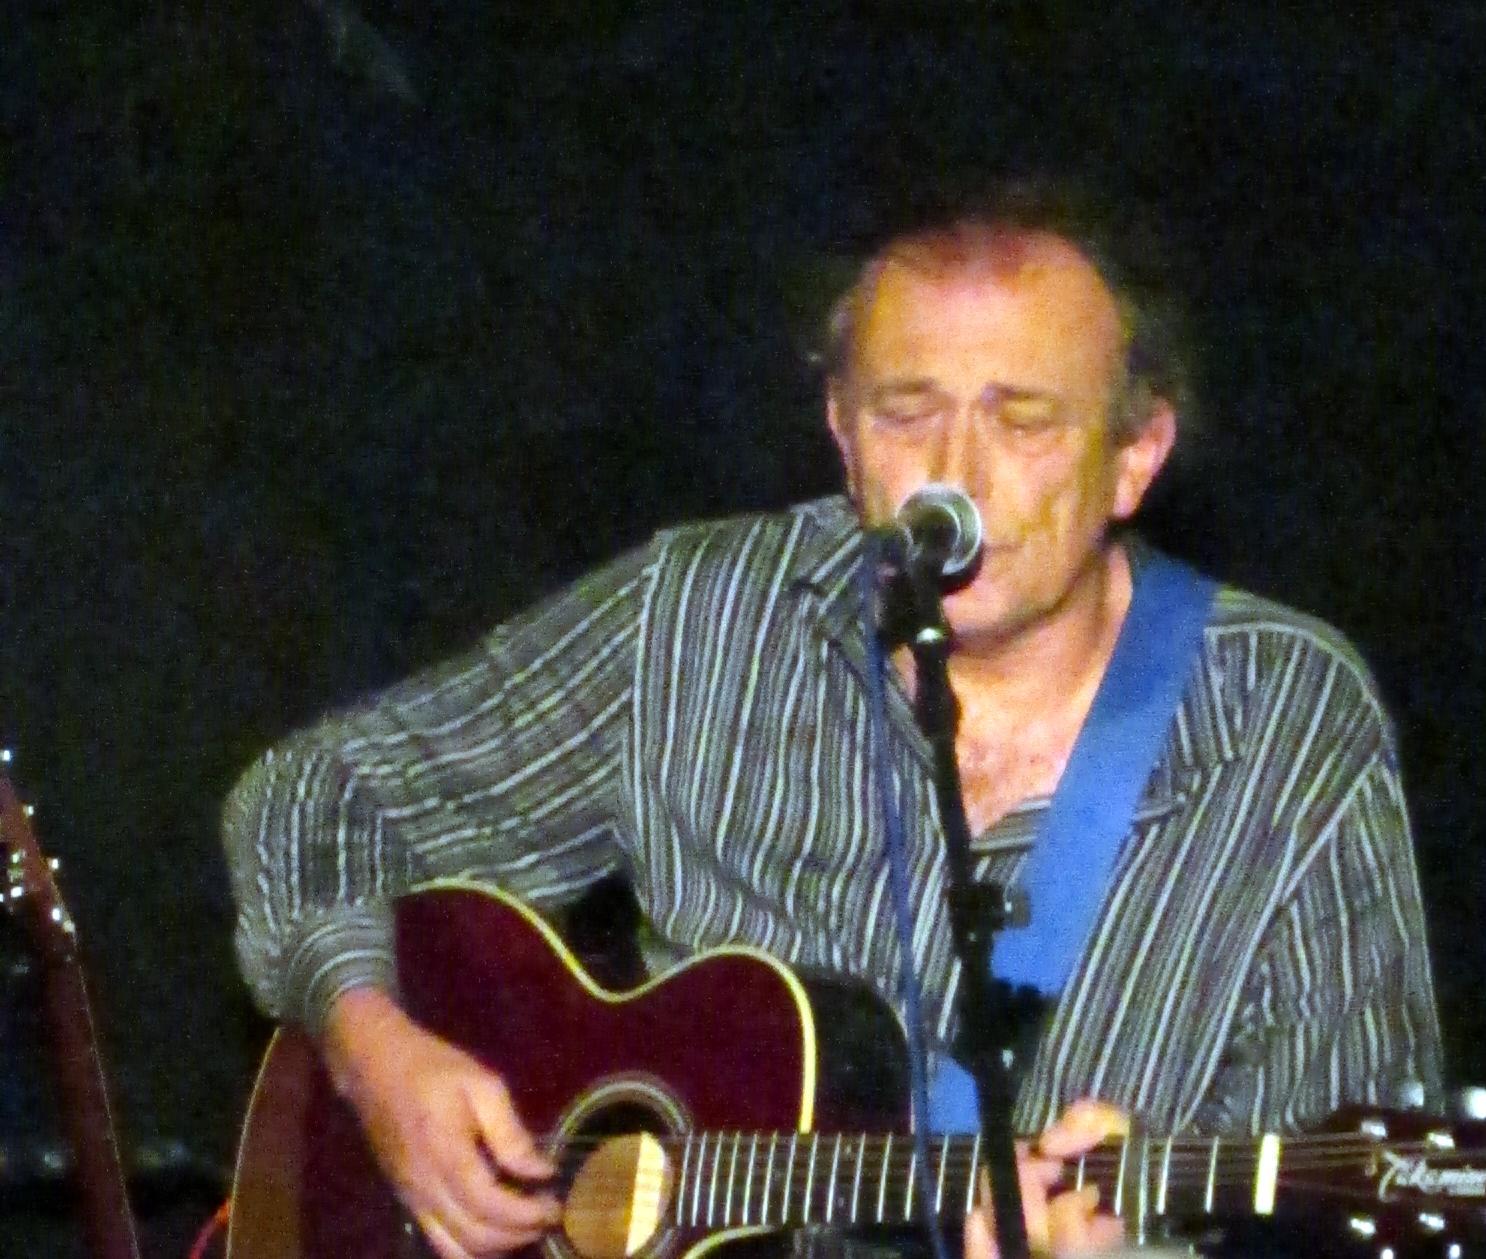 Mick Mepham